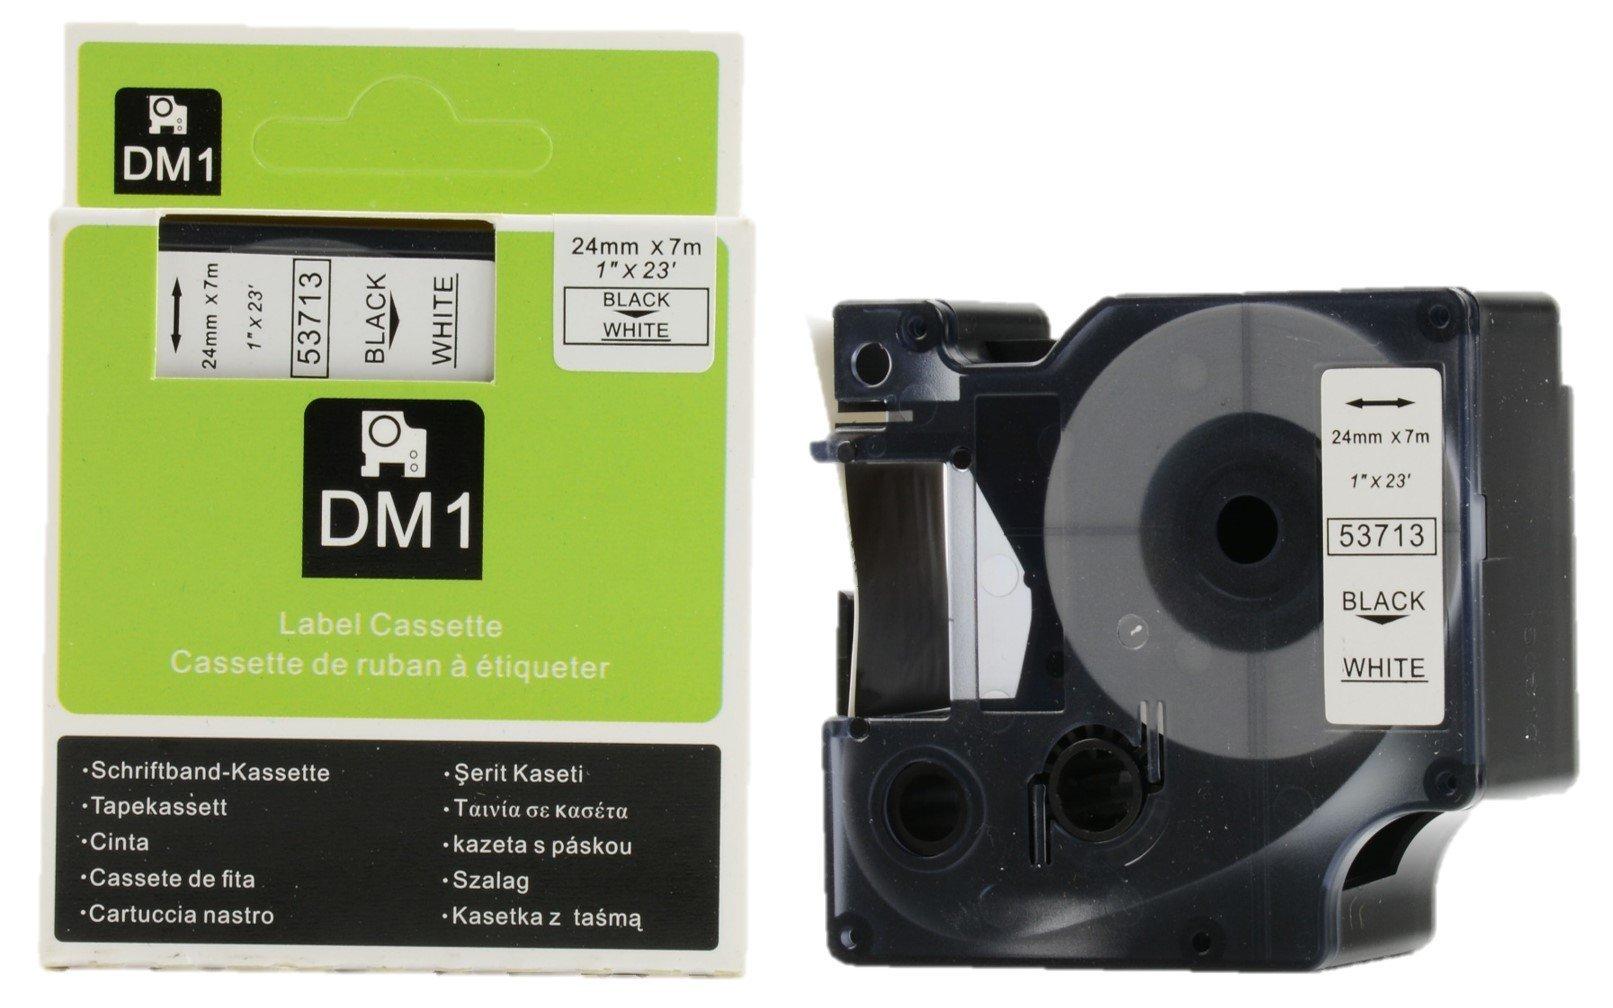 DYMO Authentic Standard D1 53713 Labeling Tape (Black Print on White Tape, 1'' W x 23' L, 1 Cartridge)